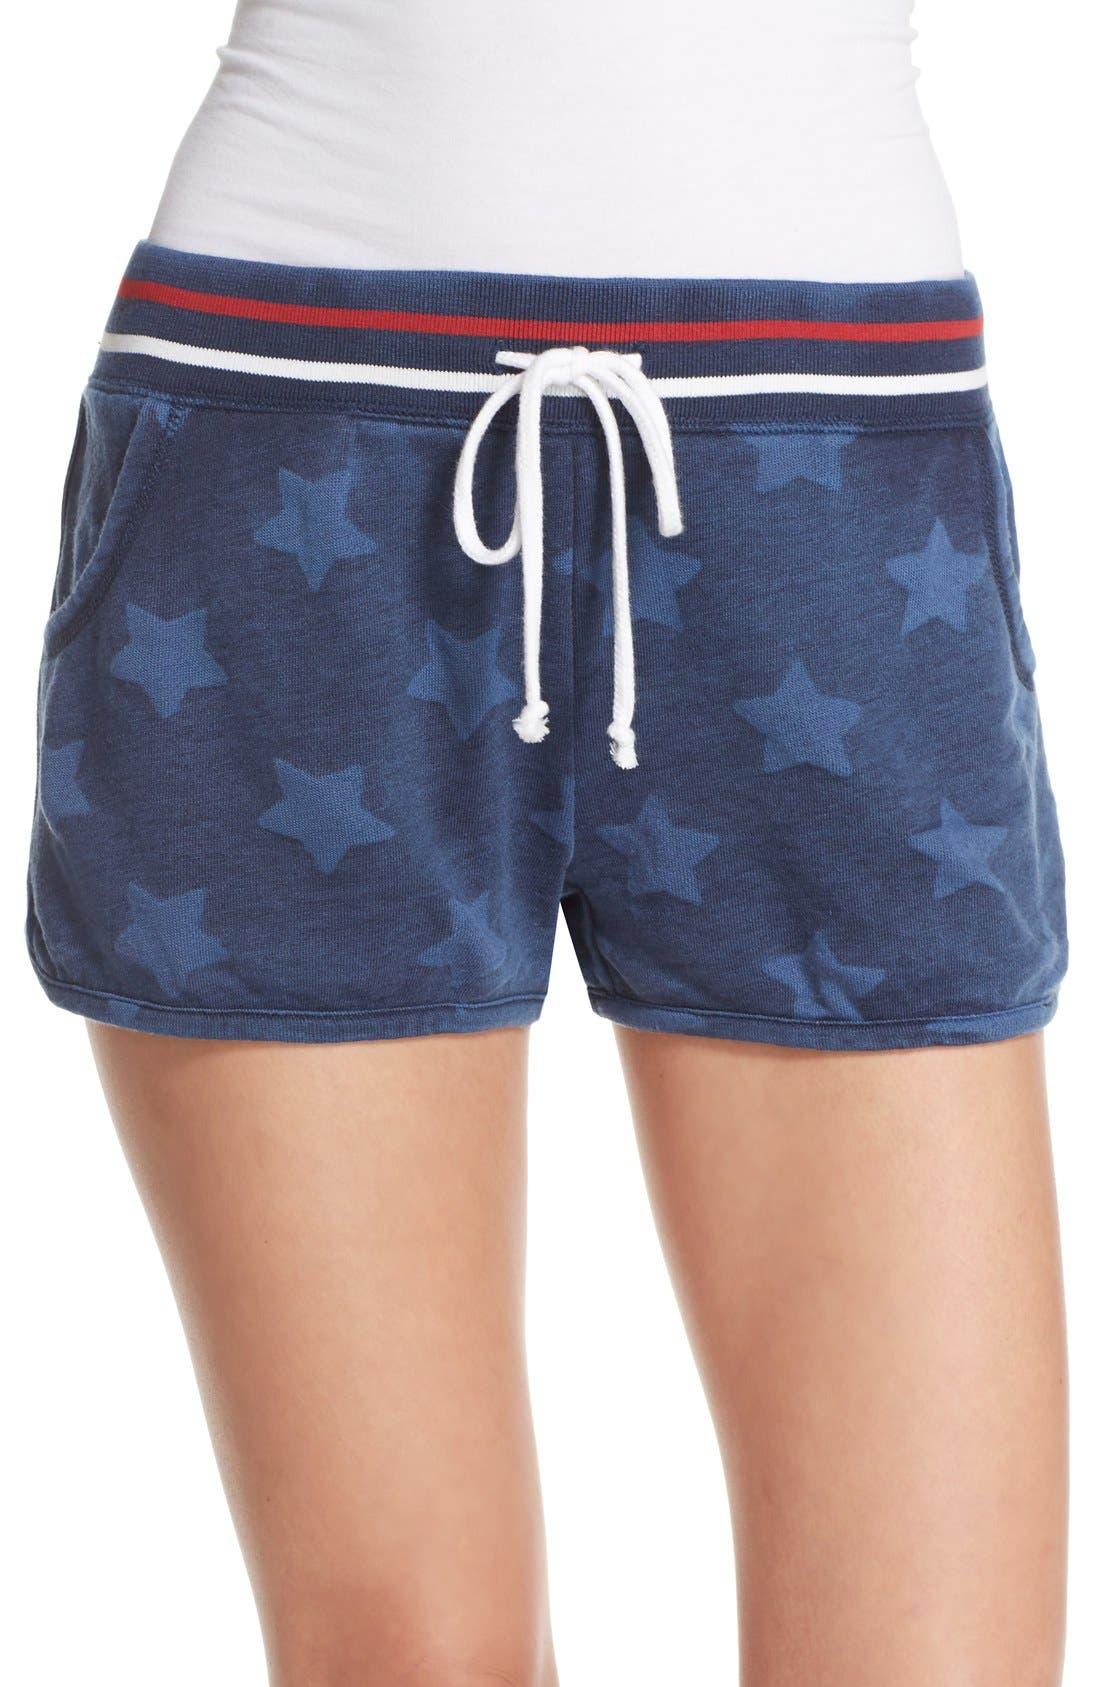 Main Image - PJ Salvage 'Road Trip' Star Print Pajama Shorts